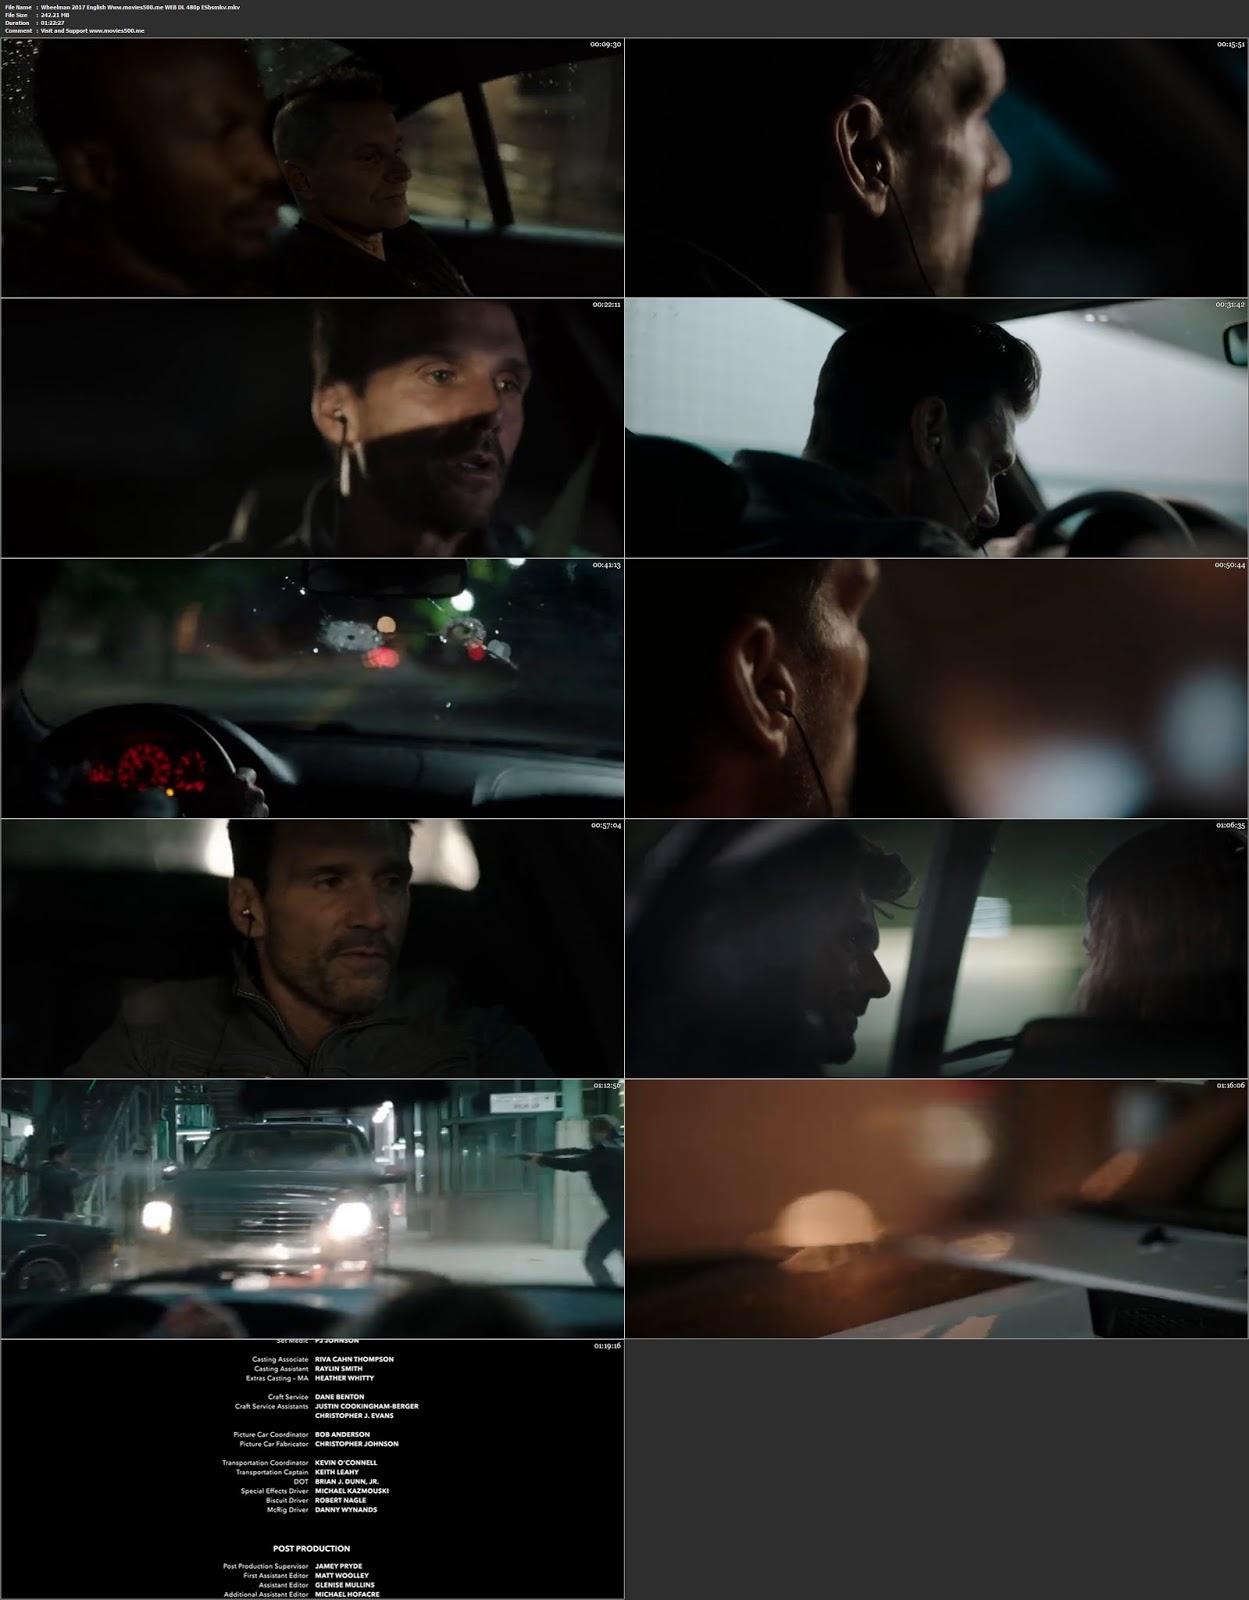 Wheelman 2017 Hollywood Full Movie WEB DL 480p at tokenguy.com